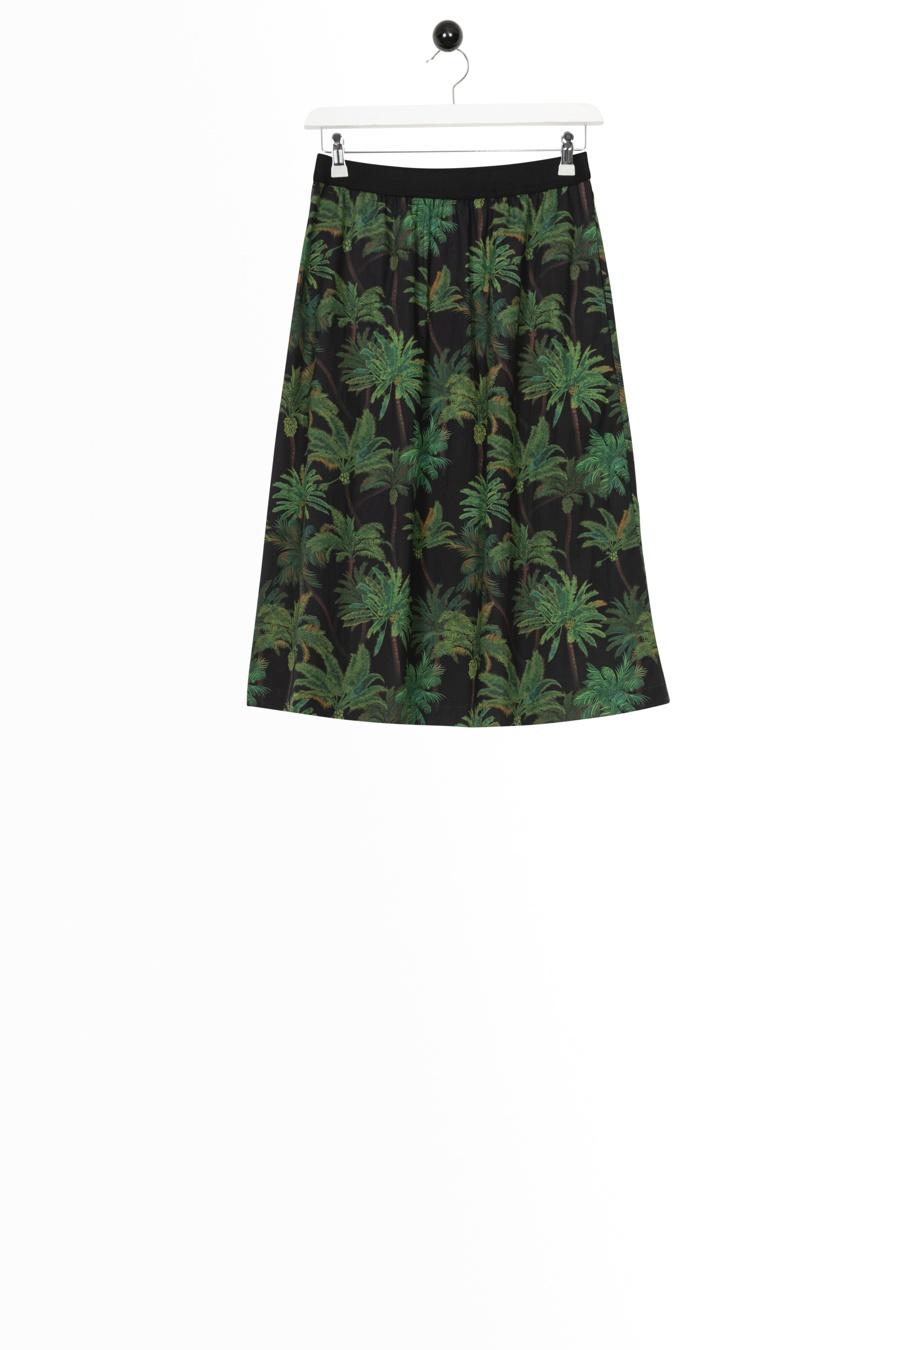 Cannes Skirt